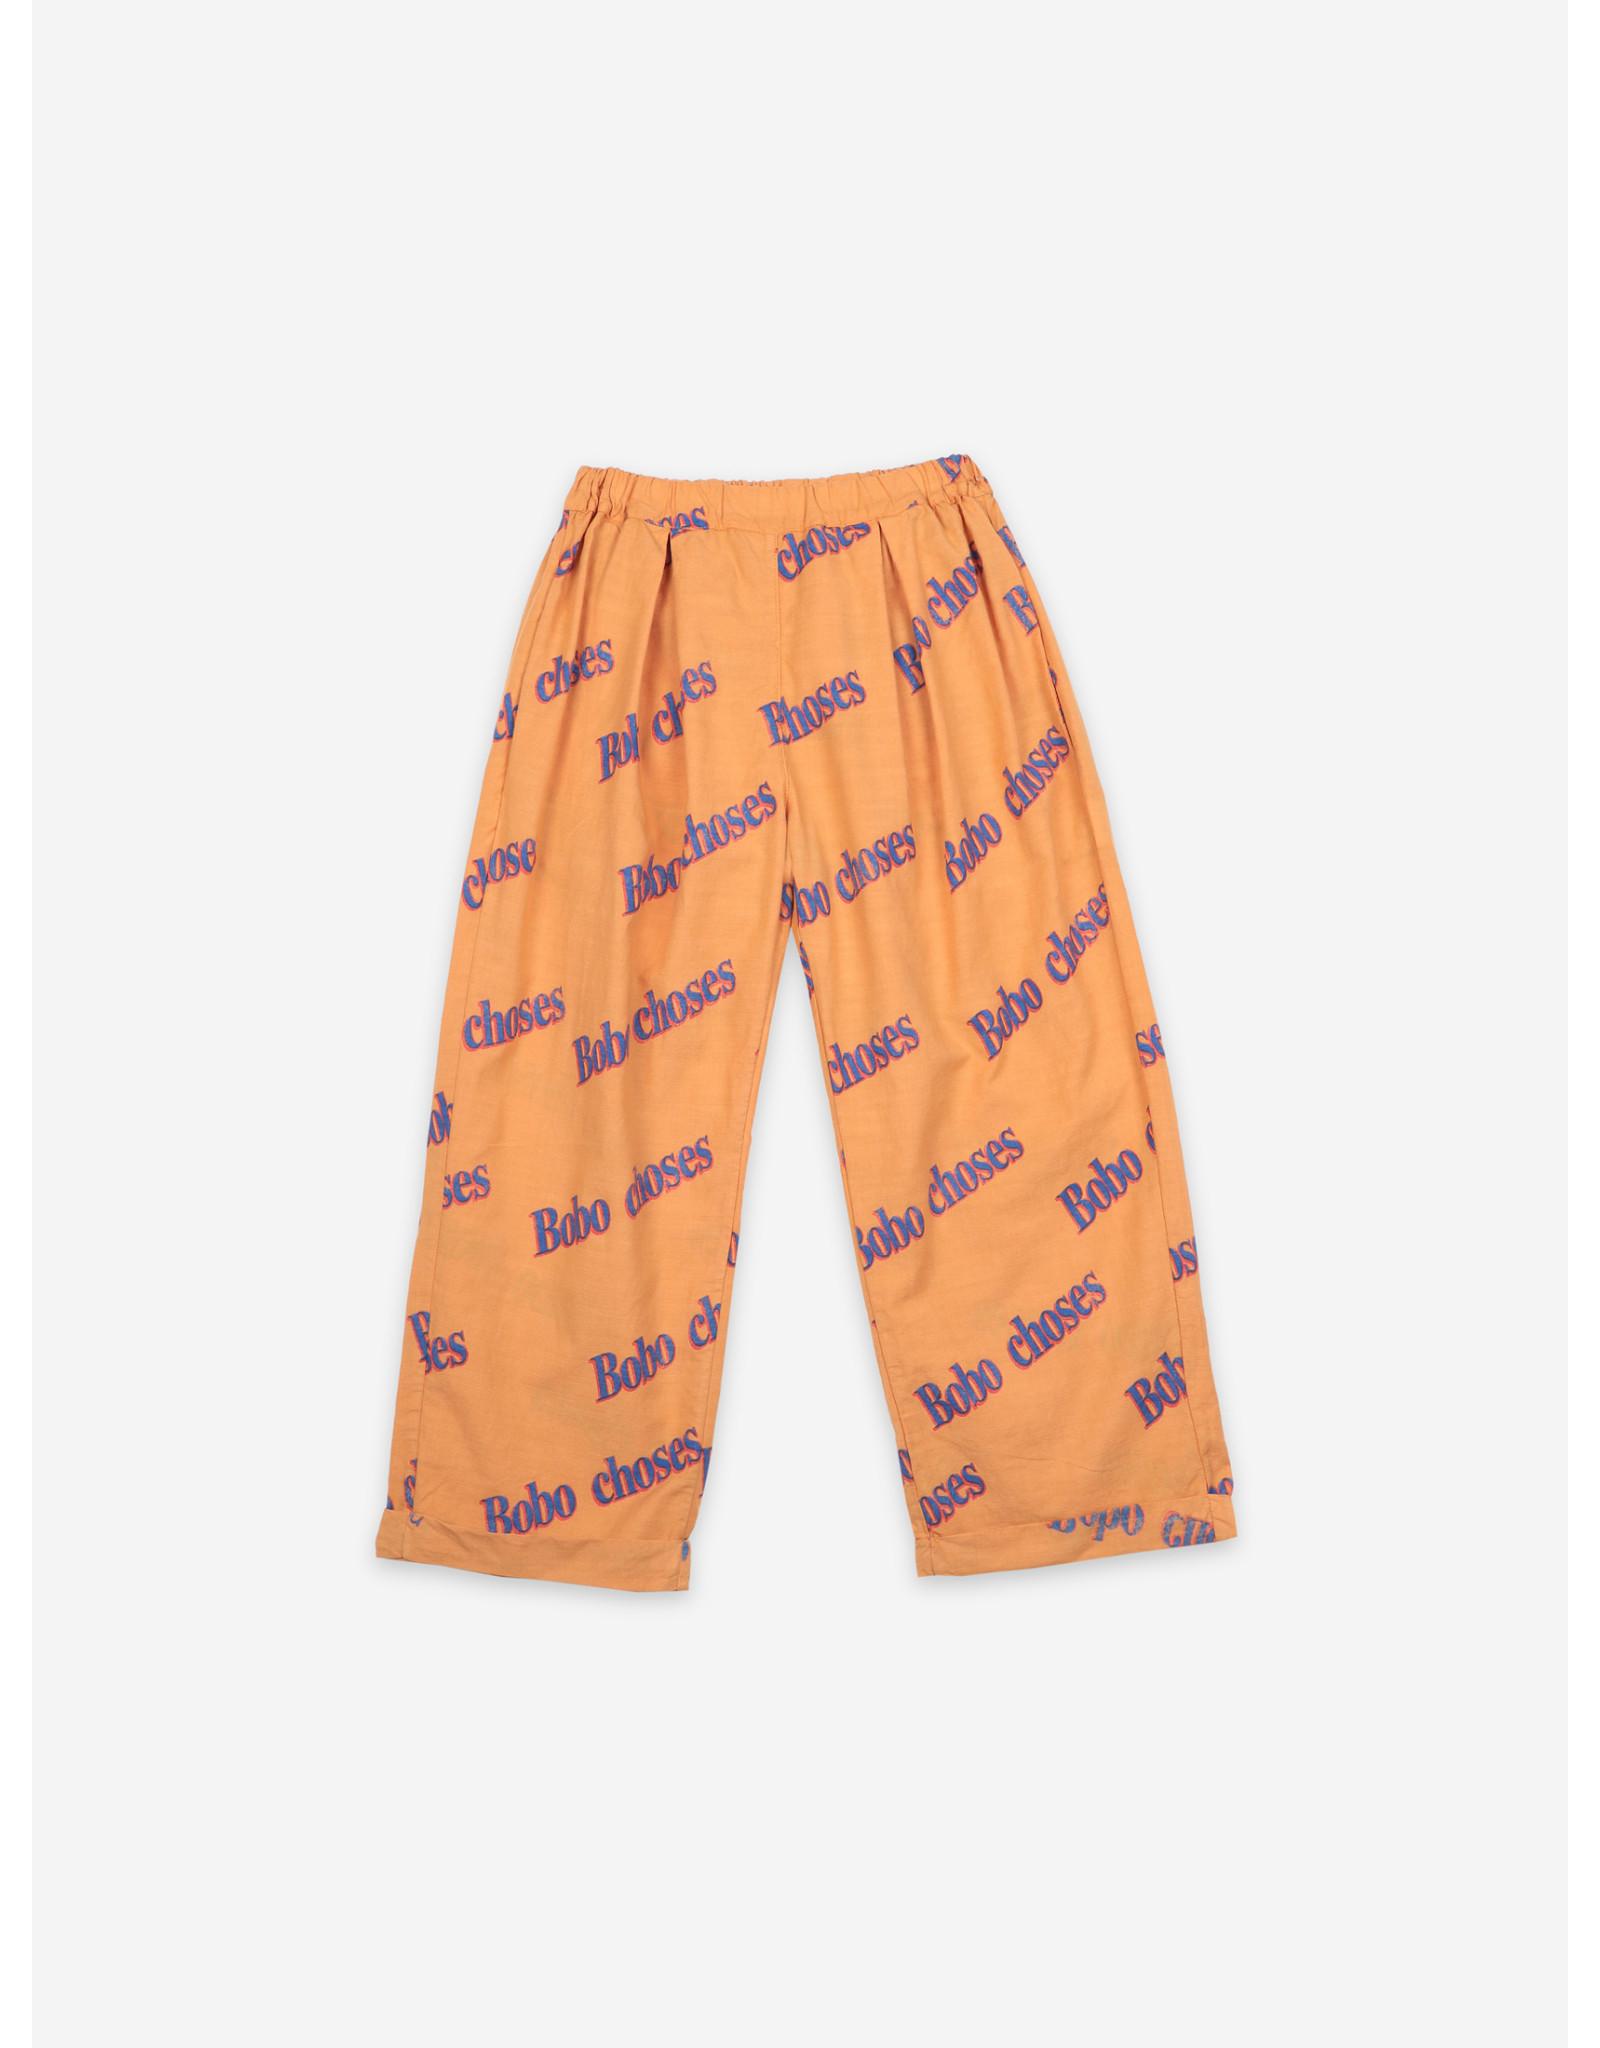 Bobo Choses Bobo Choses Bobo Retro All Over Baggy Trousers